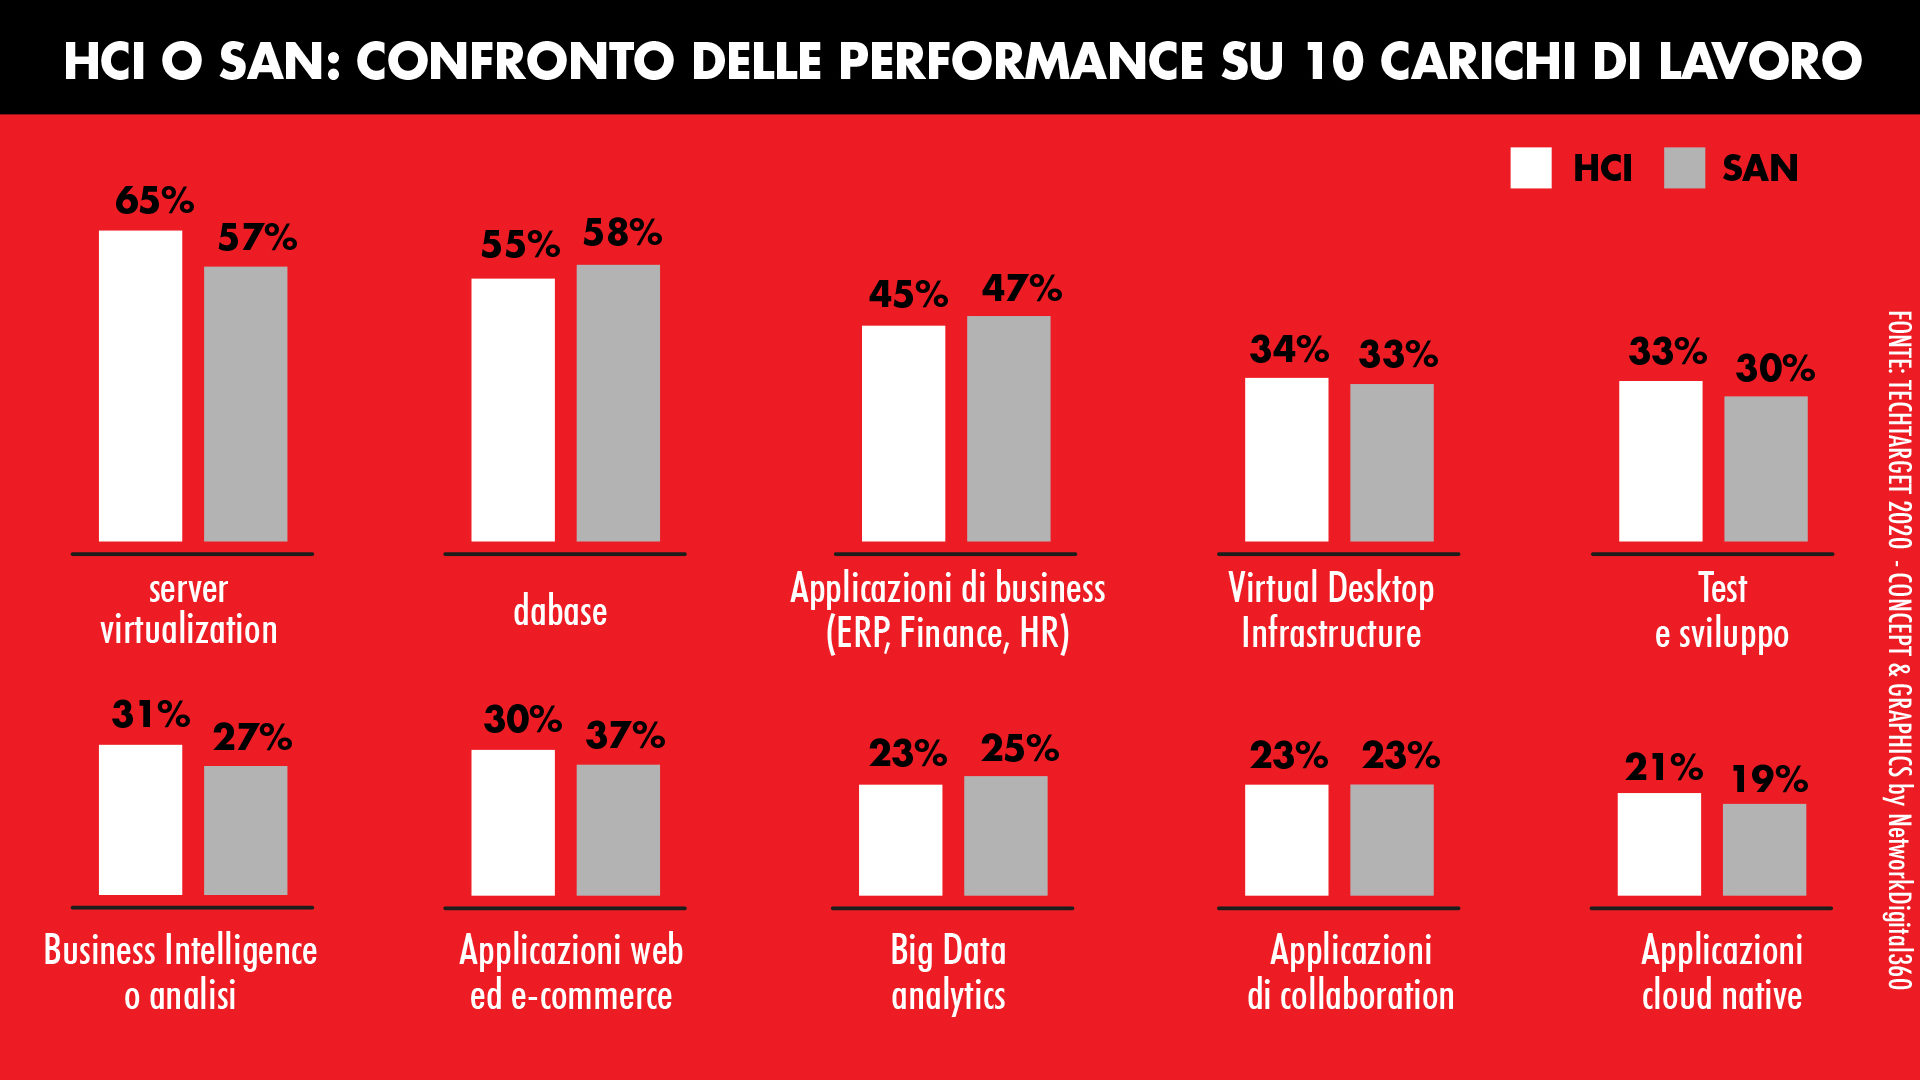 HCI e SAN performance a confronto